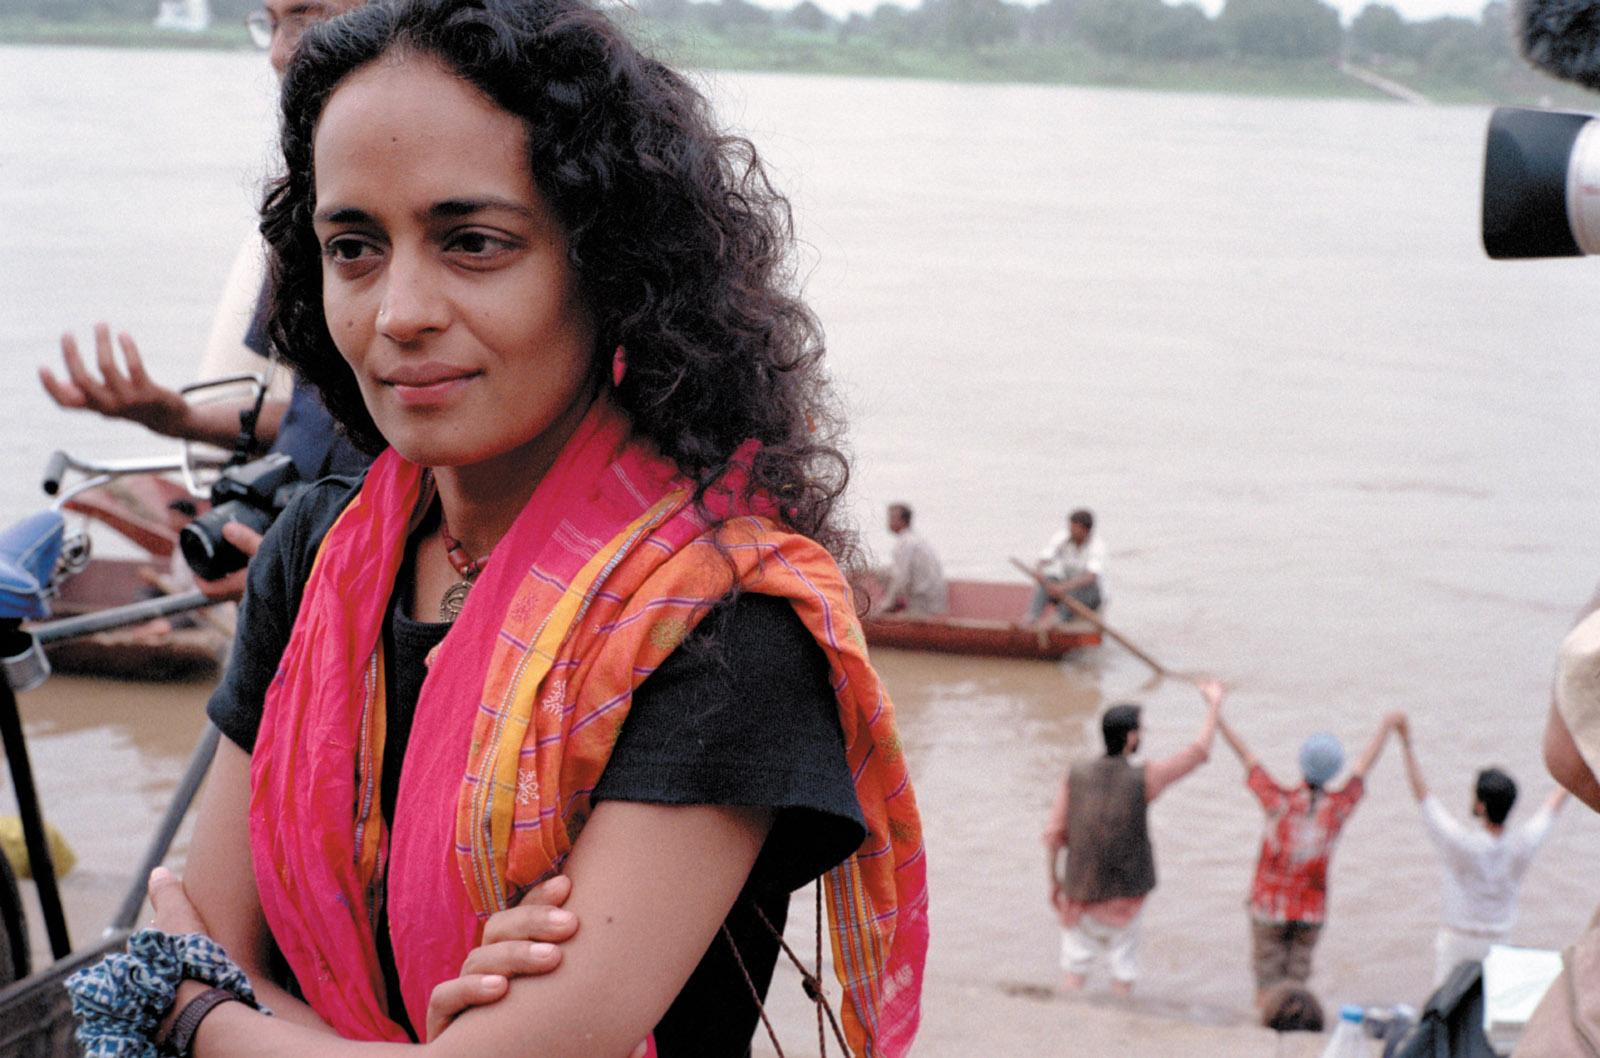 Arundhati Roy protesting the construction of the Sardar Sarovar Dam on the Narmada River, Gujarat, India, 1999